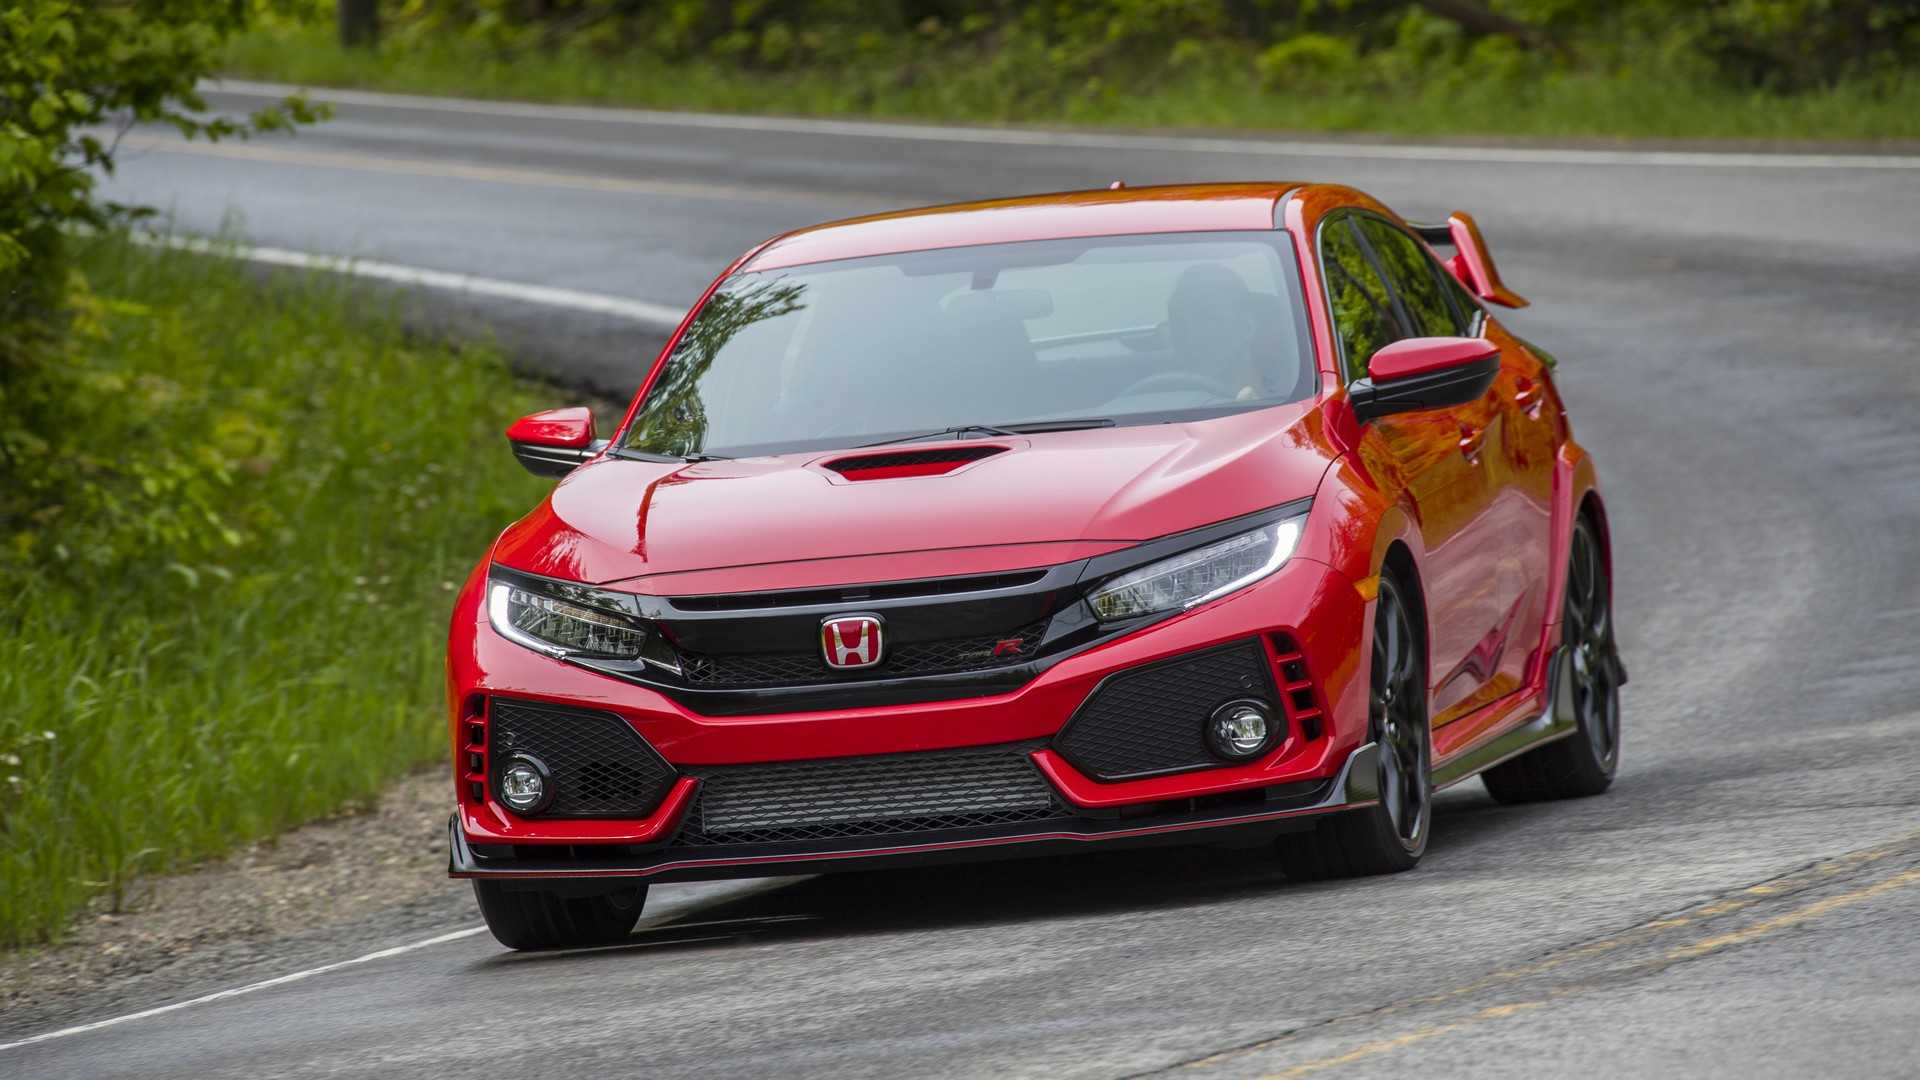 2019 Honda Civic Type R (Color: Rallye Red) Front Wallpaper (10)